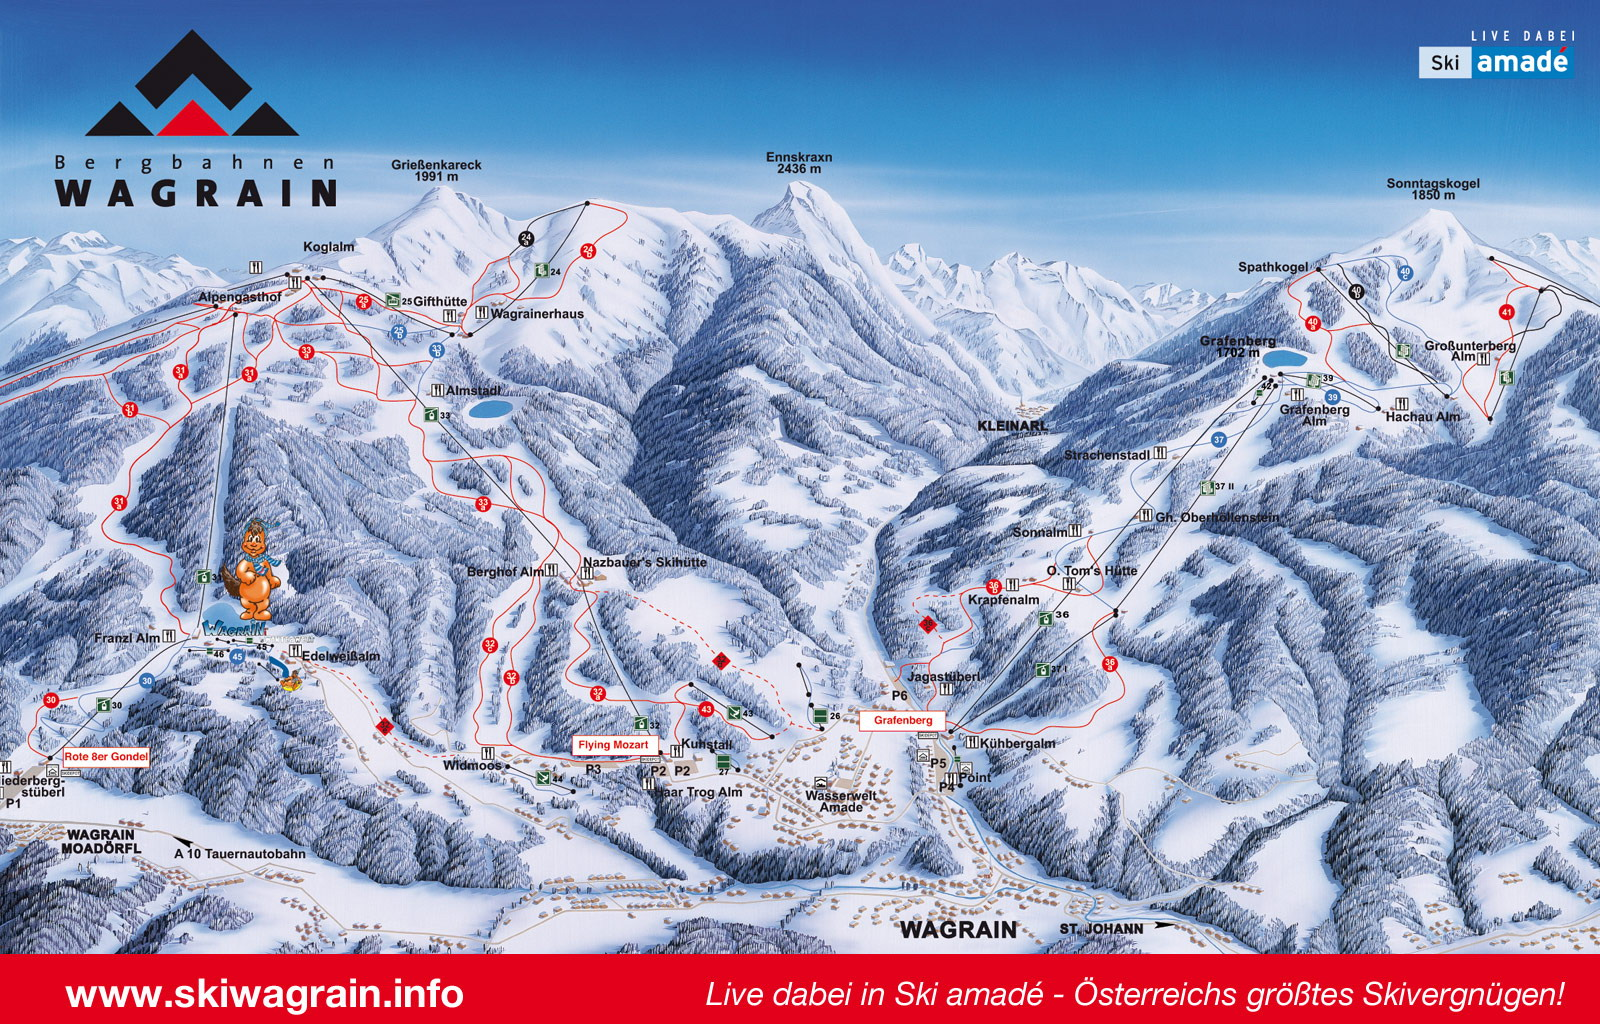 wagrain-ski-amade